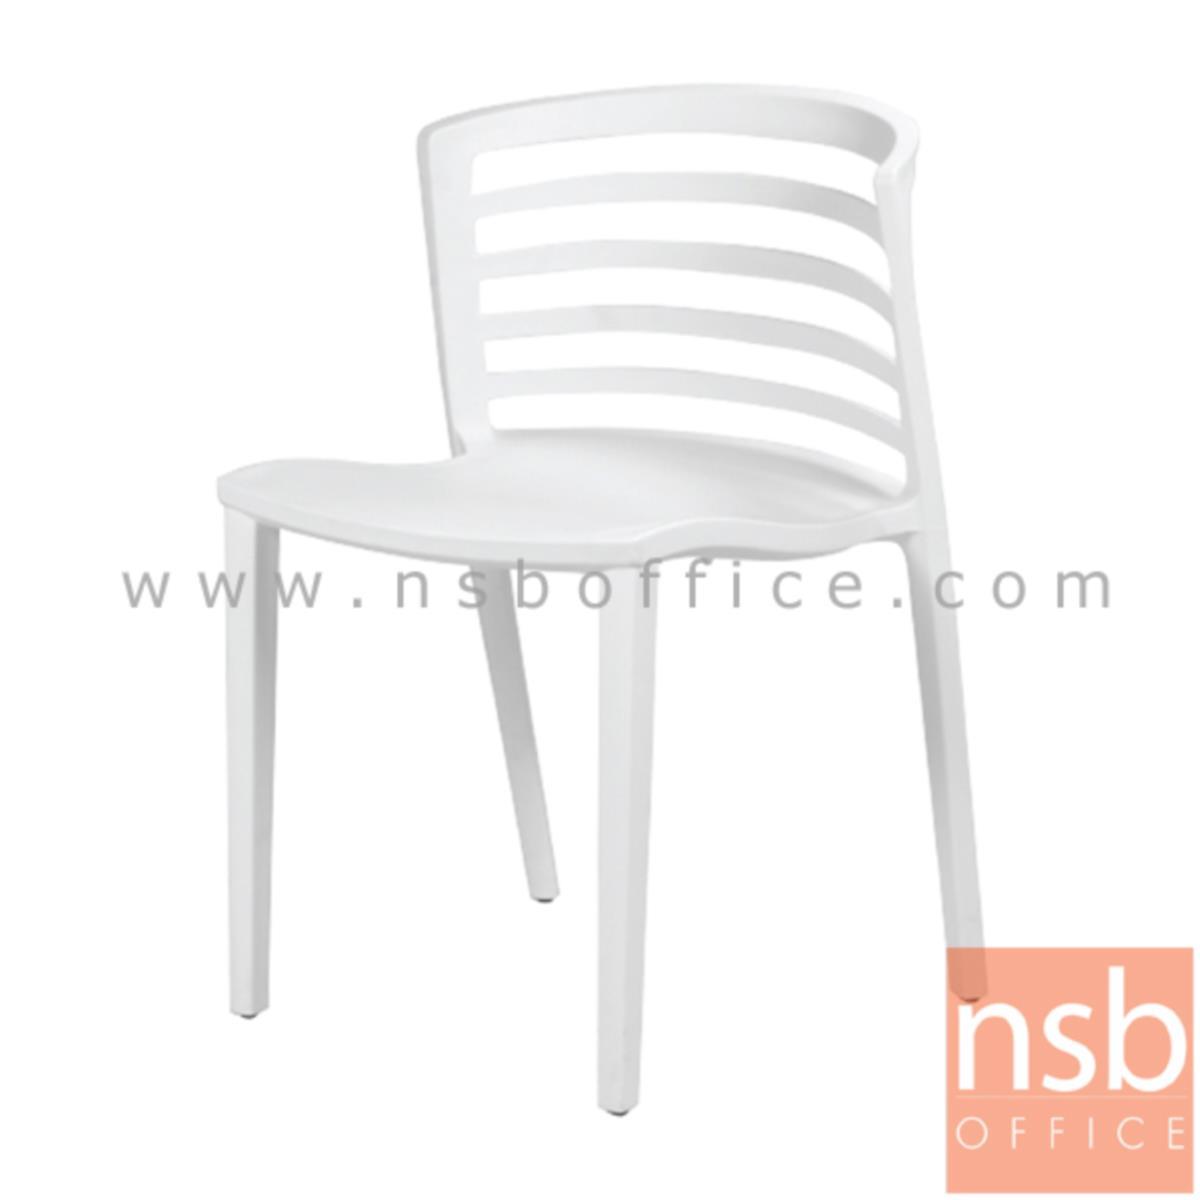 B29A063:เก้าอี้โมเดิร์นพลาสติกโพลี่(PP)ล้วน รุ่น PP9222 ขนาด 53W cm.